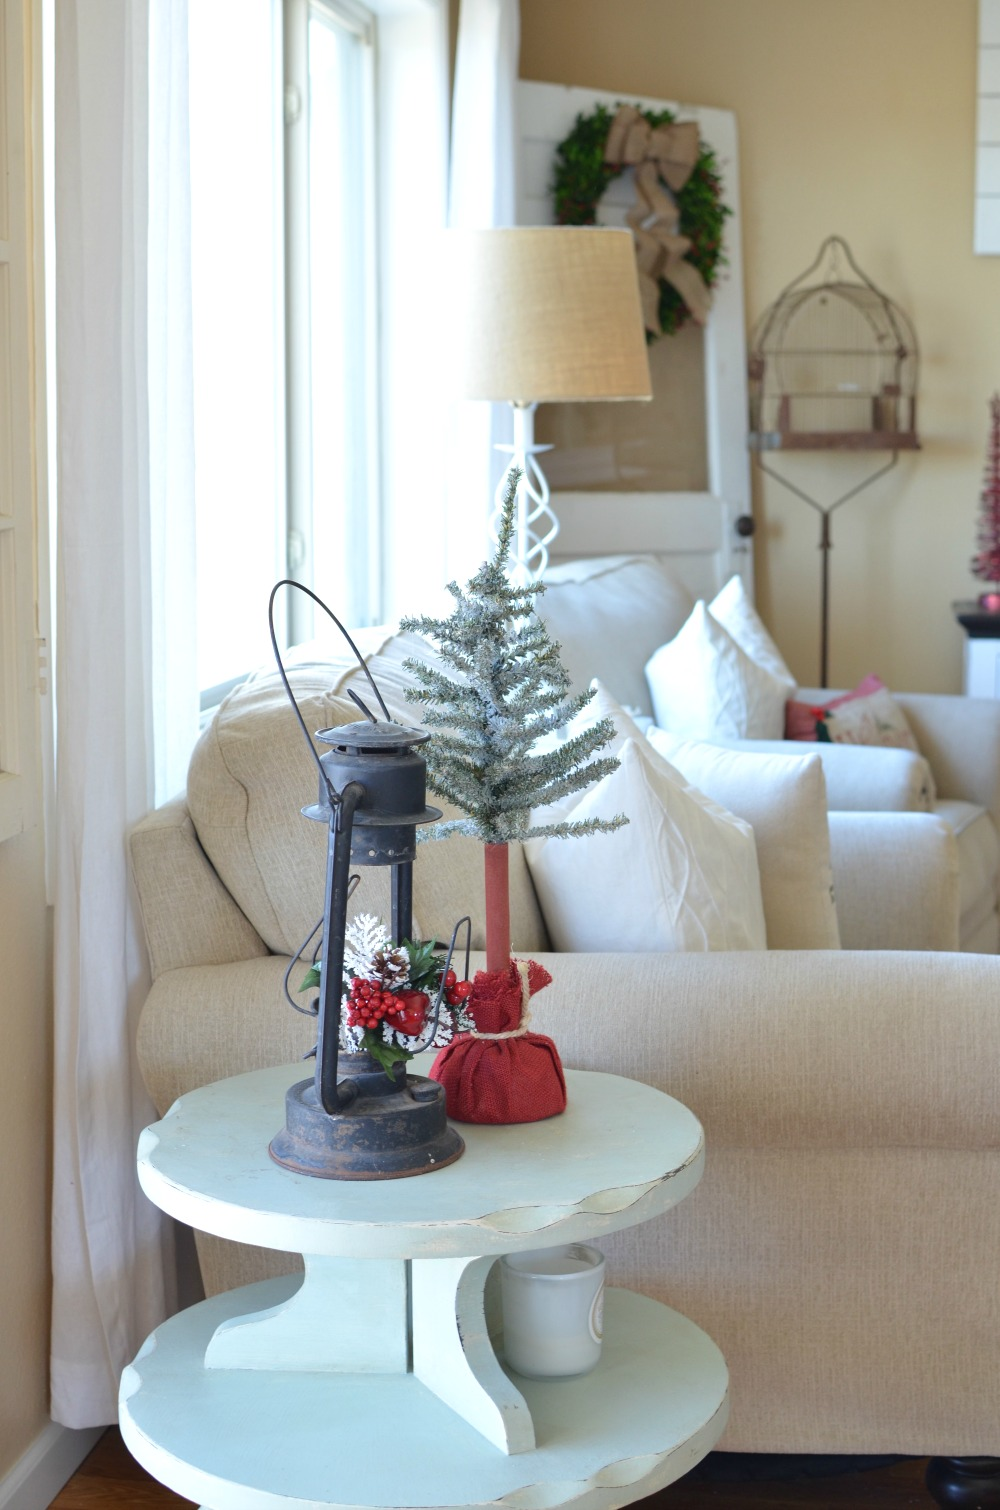 Cozy Christmas Living Room - Little Vintage Nest